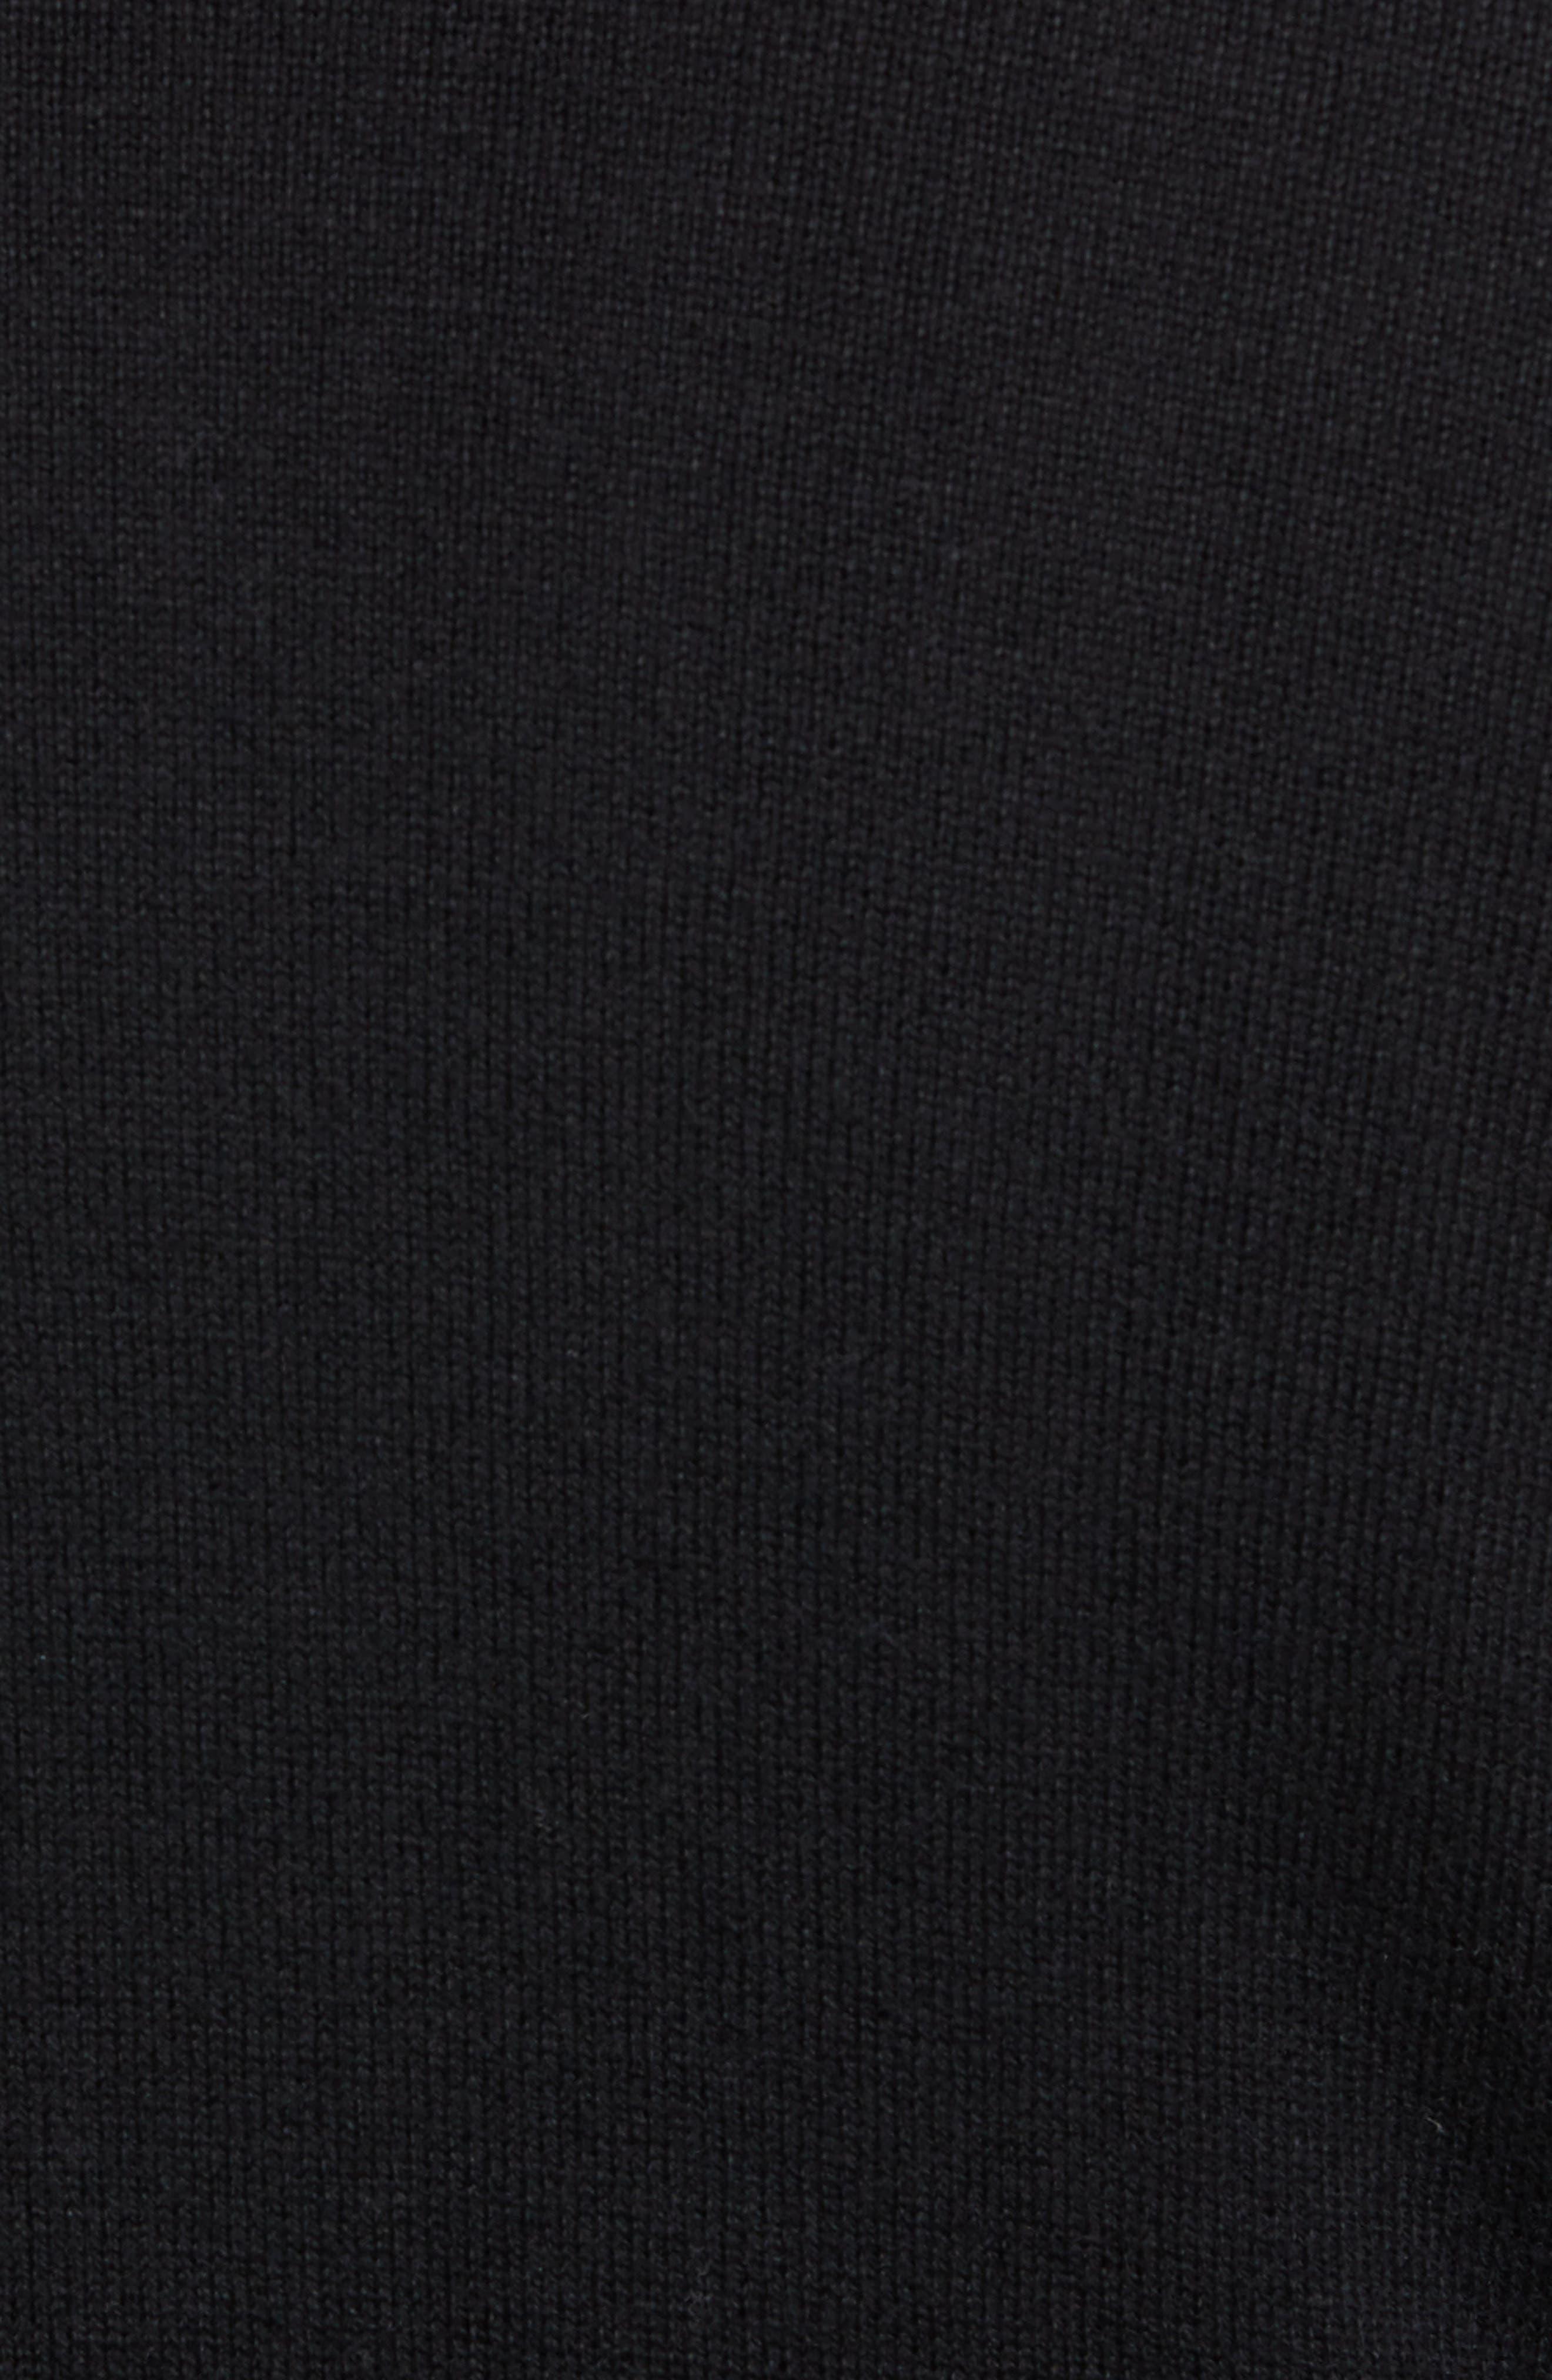 Yorkville Zip Sweater,                             Alternate thumbnail 5, color,                             BLACK